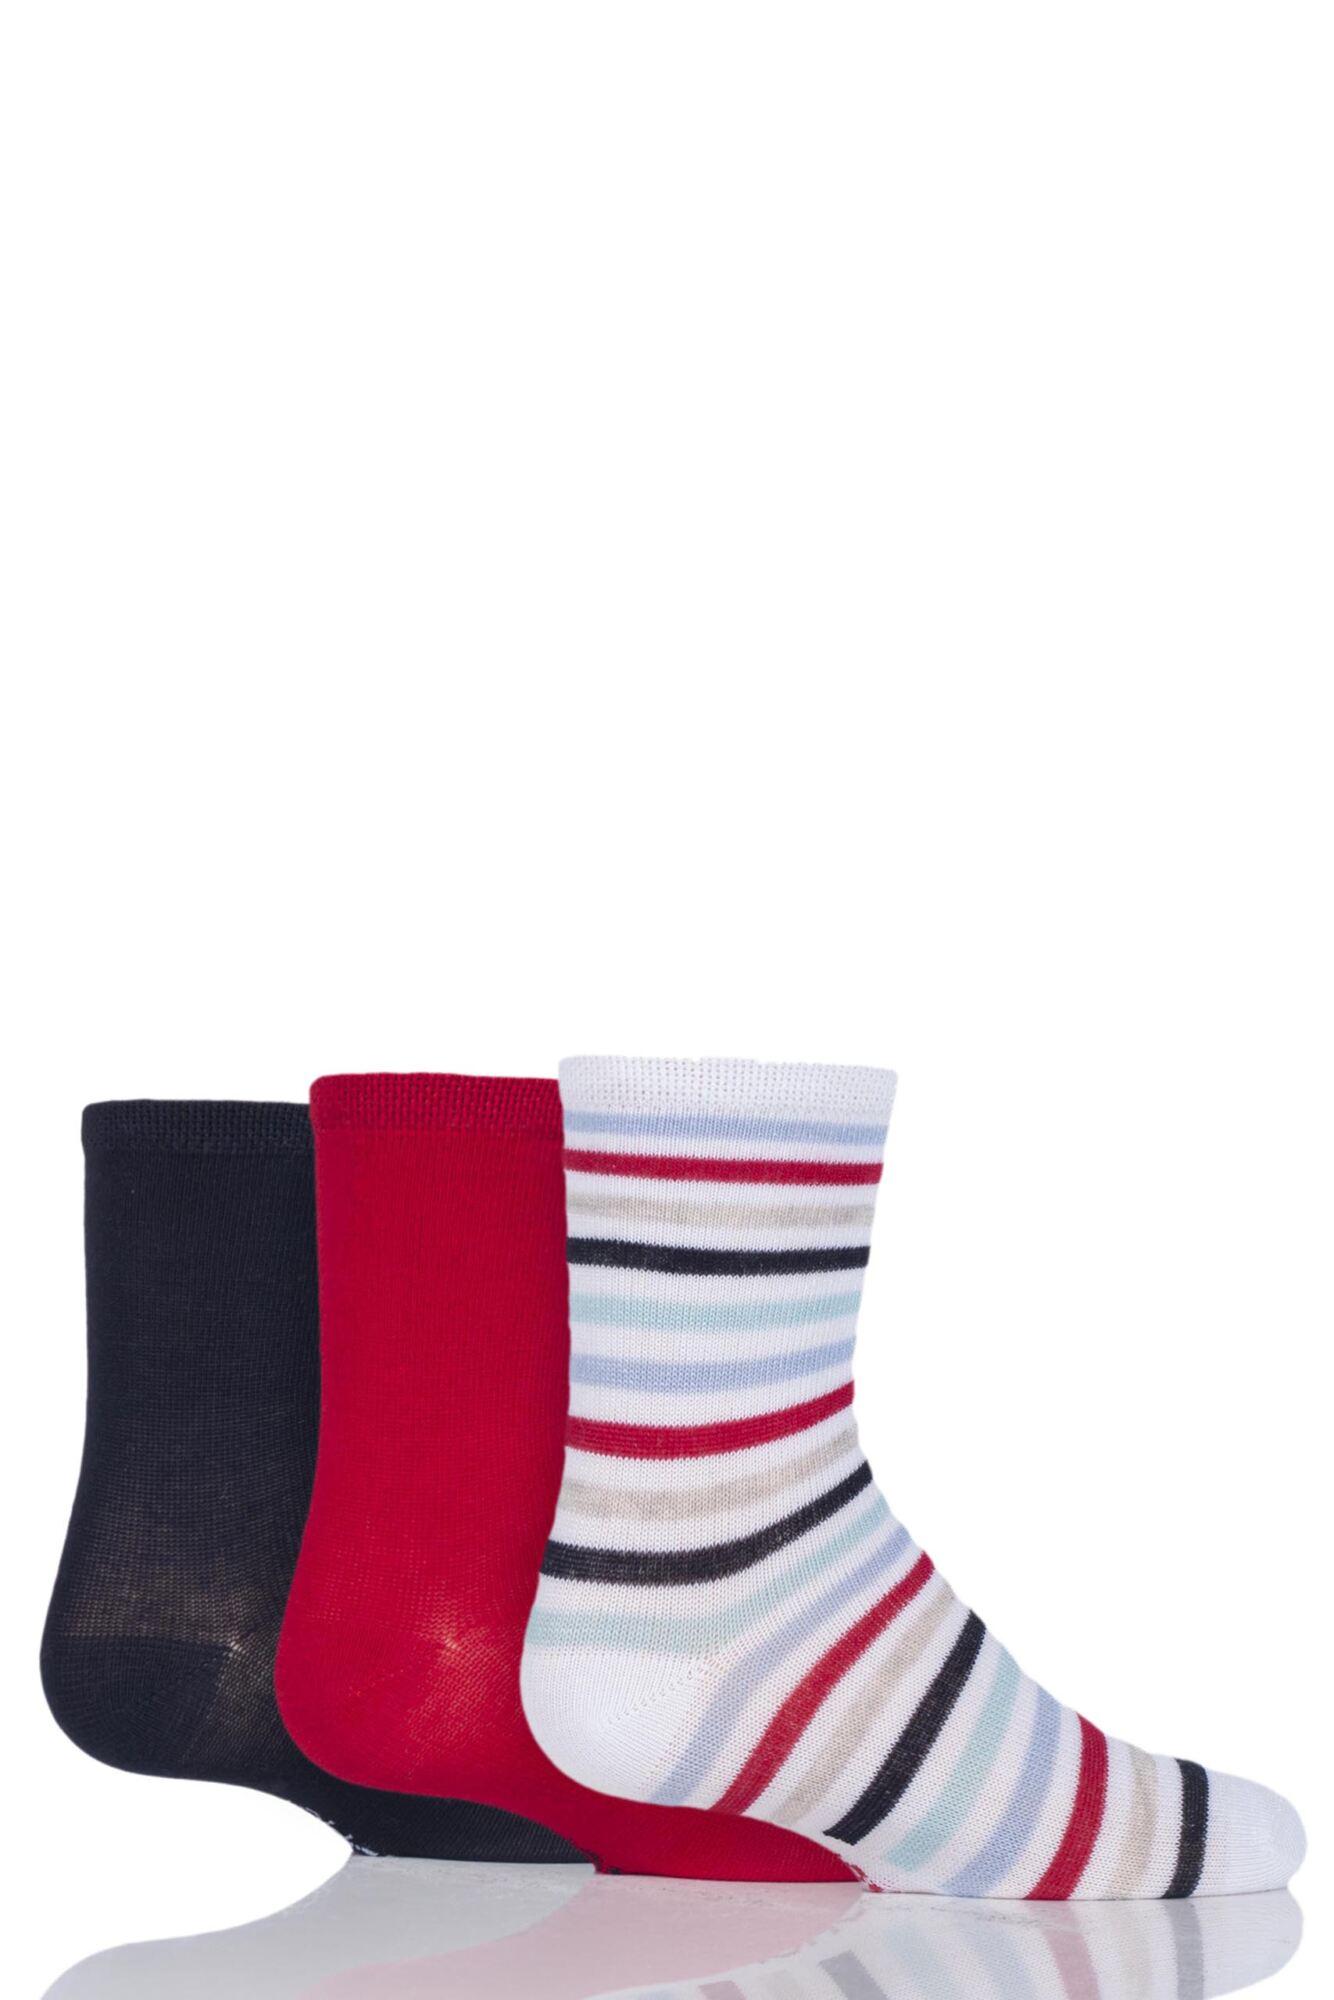 3 Pair Plain and Stripe Bamboo Socks with Smooth Toe Seams Kids Unisex - SOCKSHOP